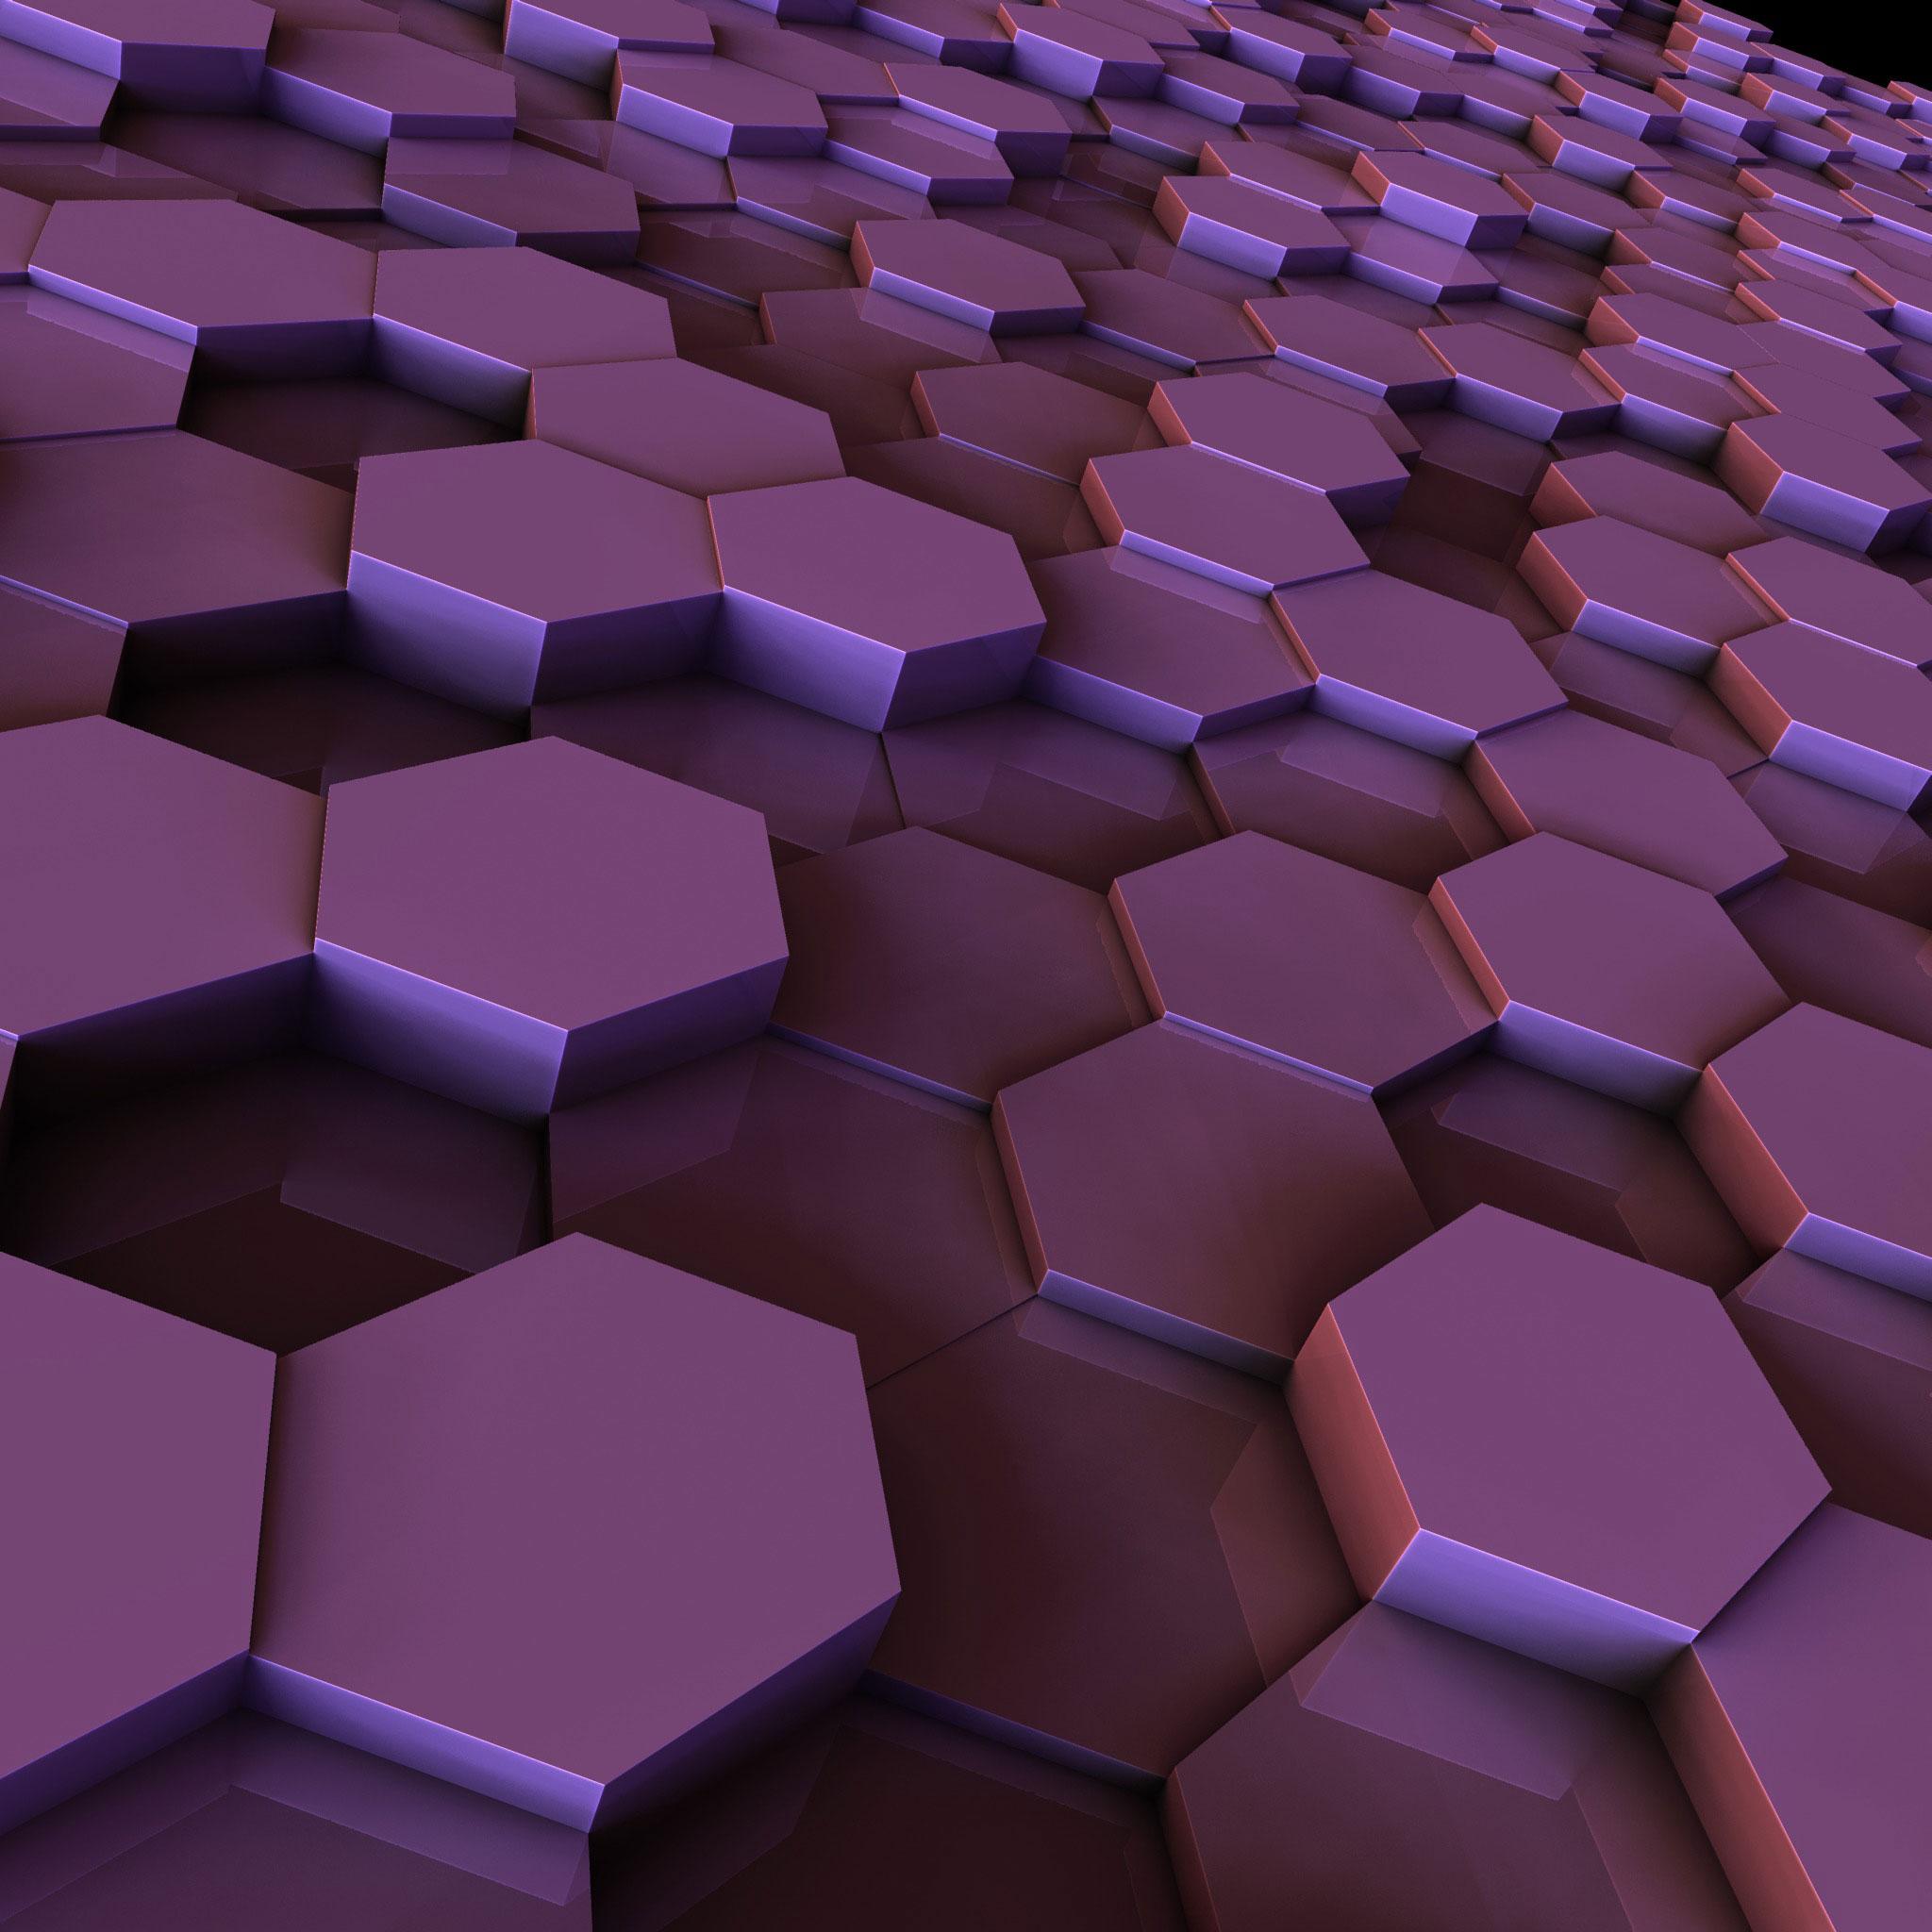 60 HD IPad Retina Wallpapers